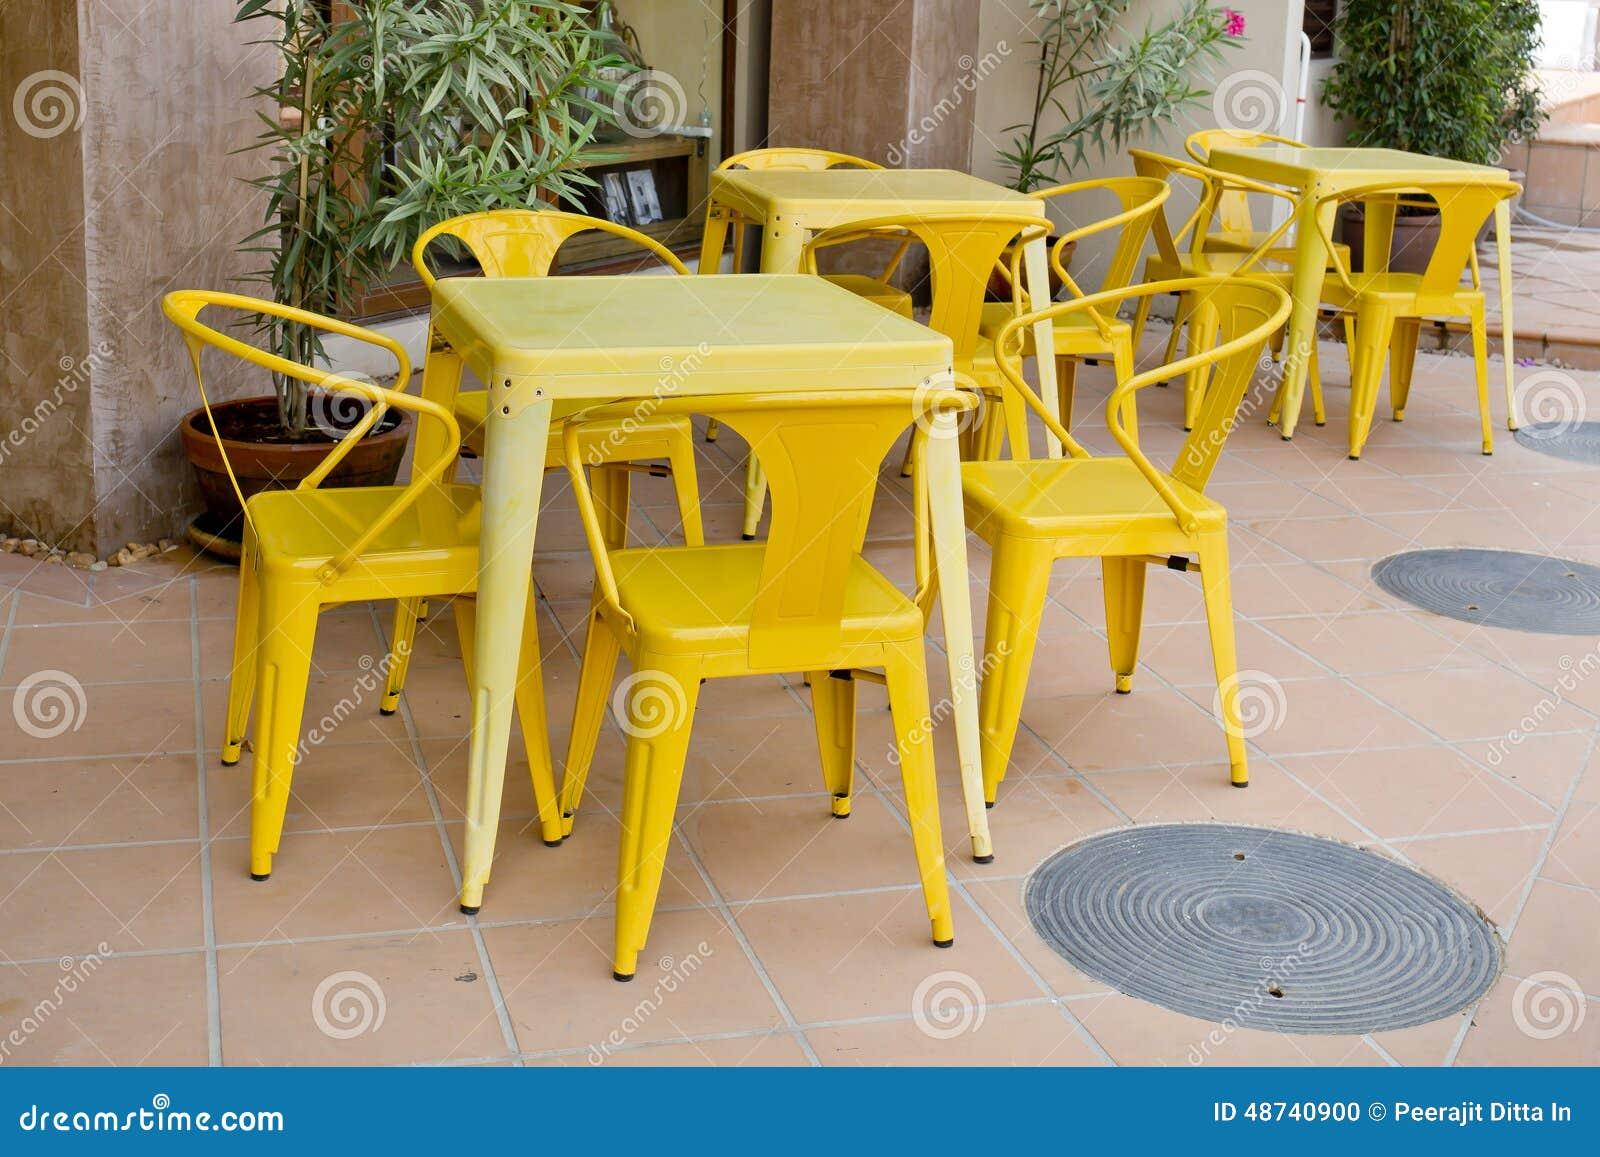 chaises jaunes. Black Bedroom Furniture Sets. Home Design Ideas